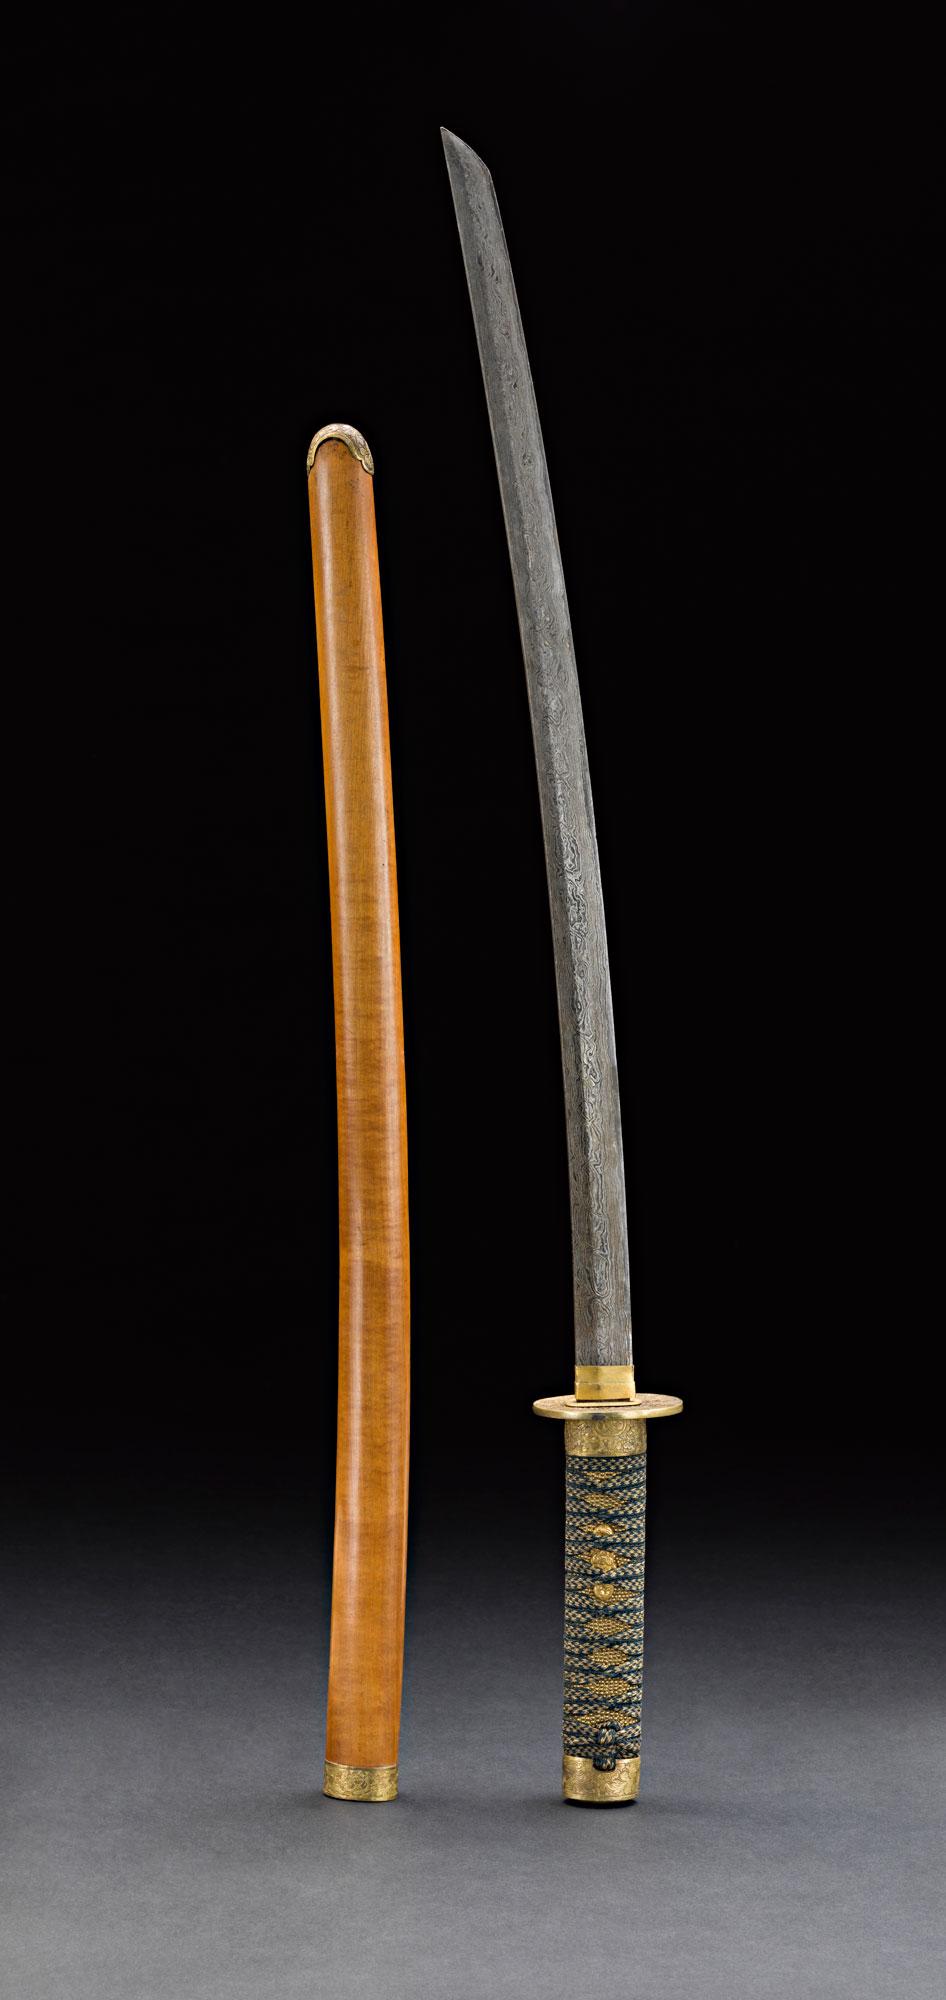 Japanese-style Sword with Satinwood Scabbard Gift from King Mongkut to President Franklin Pierce, 1856 83 cm length Courtesy of the Smithsonian Institution, Department of Anthropology; E101-1; Photo by James Di Loreto and Lucia RM Martino  ดาบทำอย่างญี่ปุ่น ฝักไม้แก้ว ของขวัญพระราชทานจากพระบาทสมเด็จพระจอมเกล้าเจ้าอยู่หัว แก่ประธานาธิบดีแฟรงกลิน เพียร์ซ พ.ศ. ๒๓๙๙